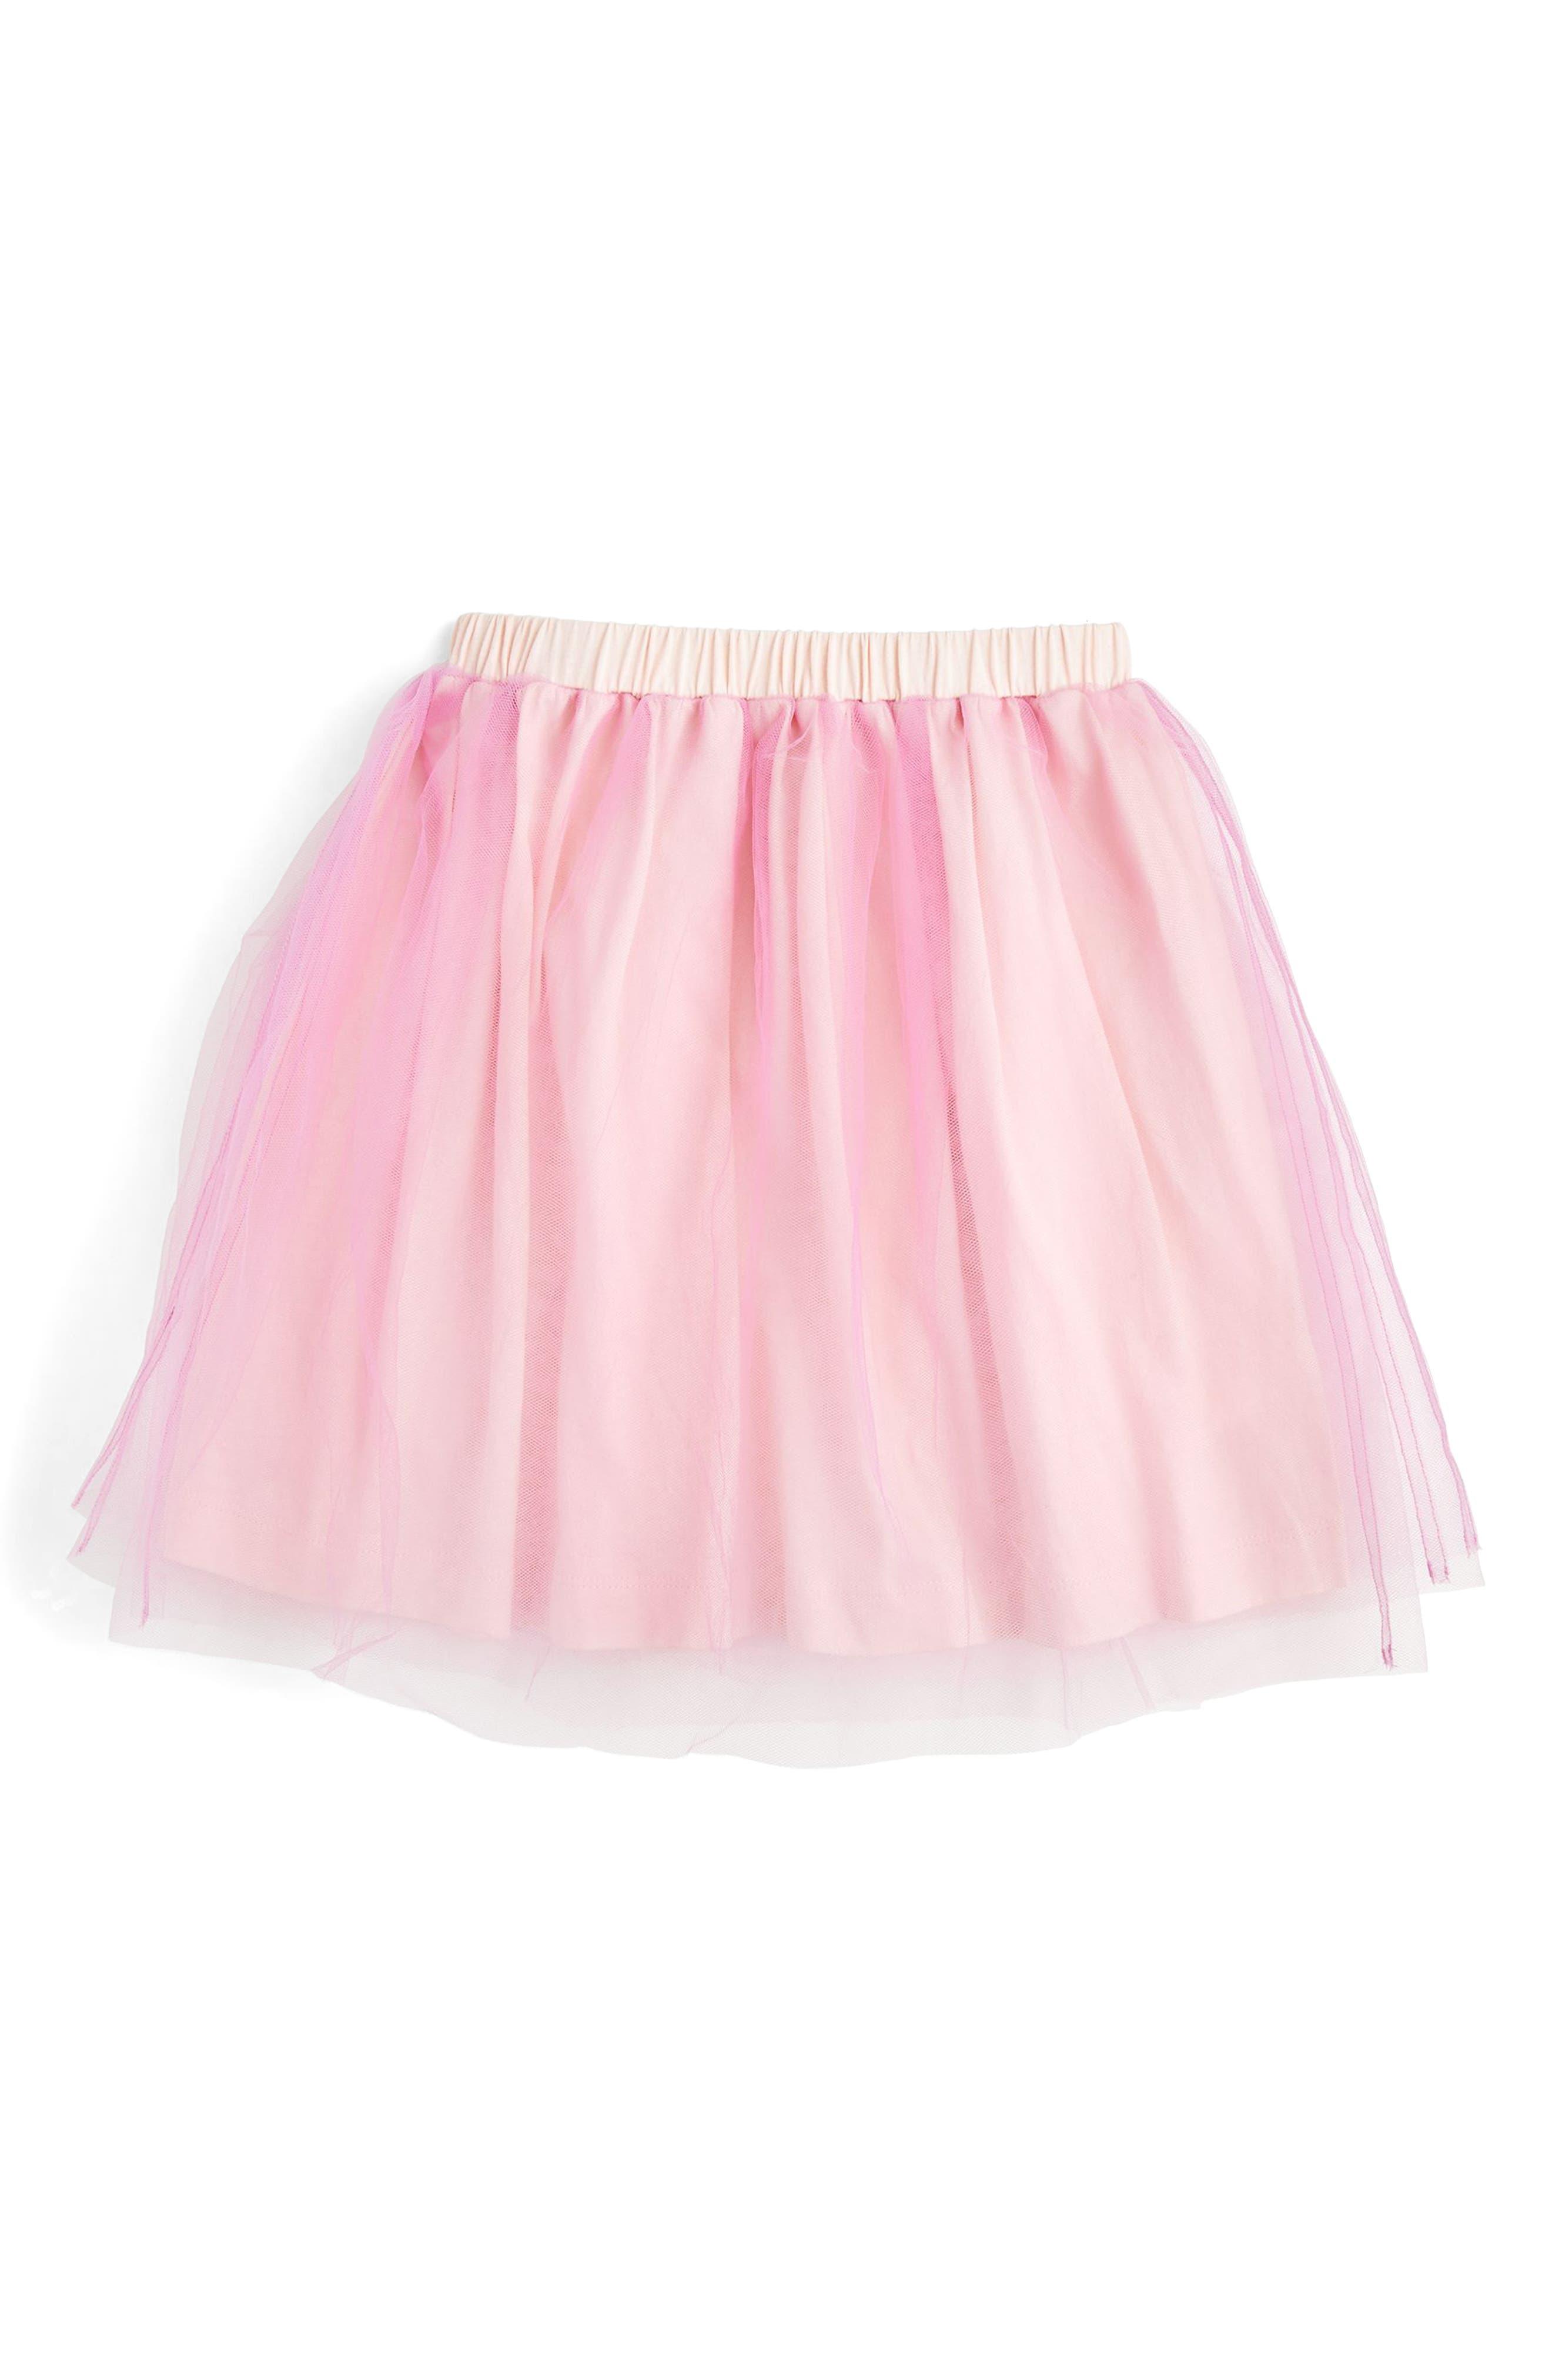 Tulle Skirt,                             Main thumbnail 1, color,                             650